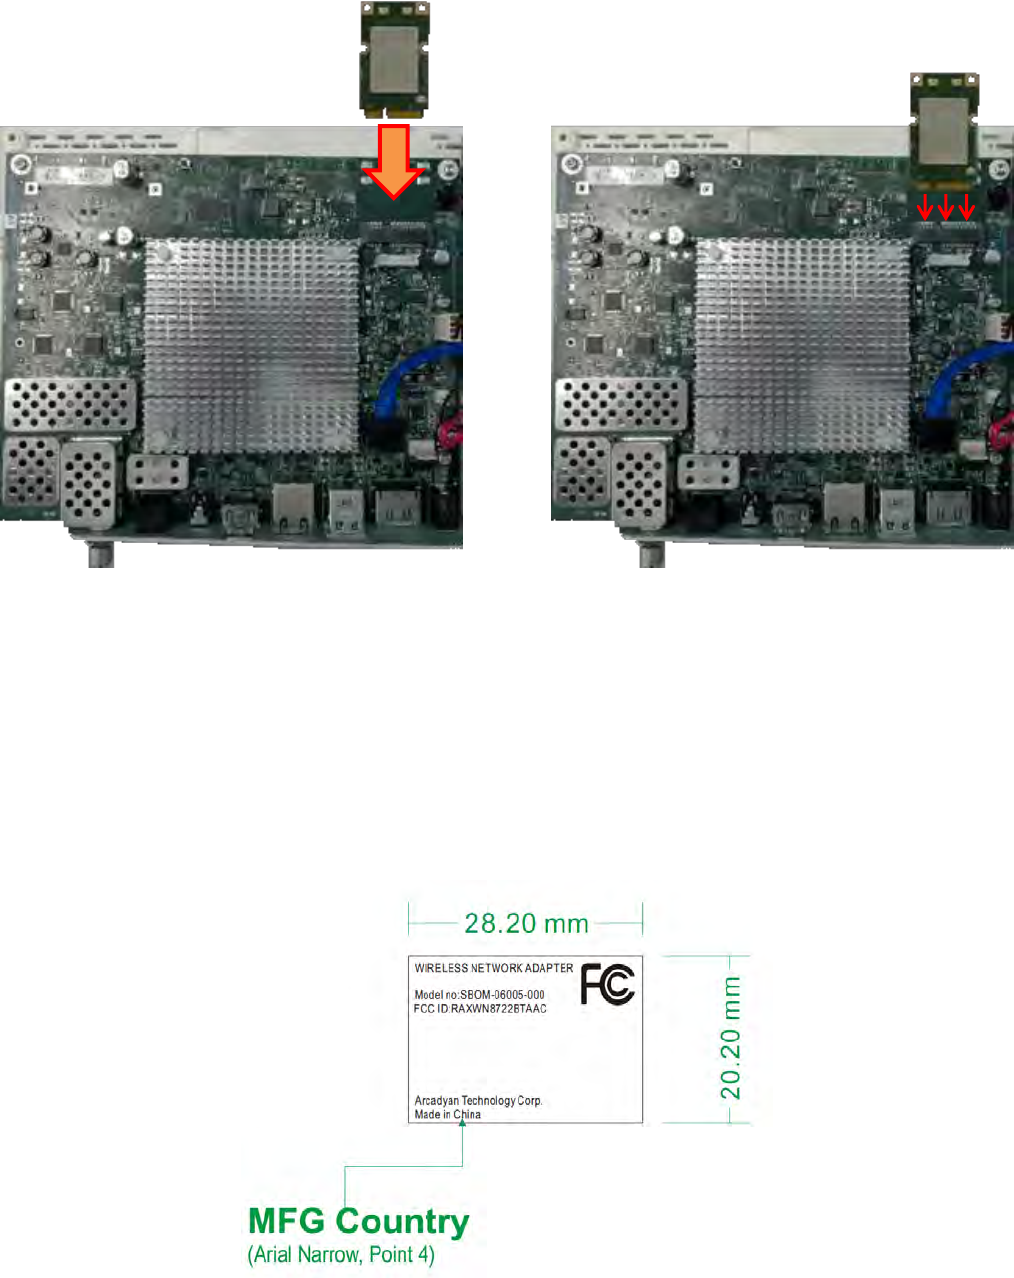 Arcadyan Technology WN8722BTAAC WN8722BTAAC-VO User Manual IEEE 802